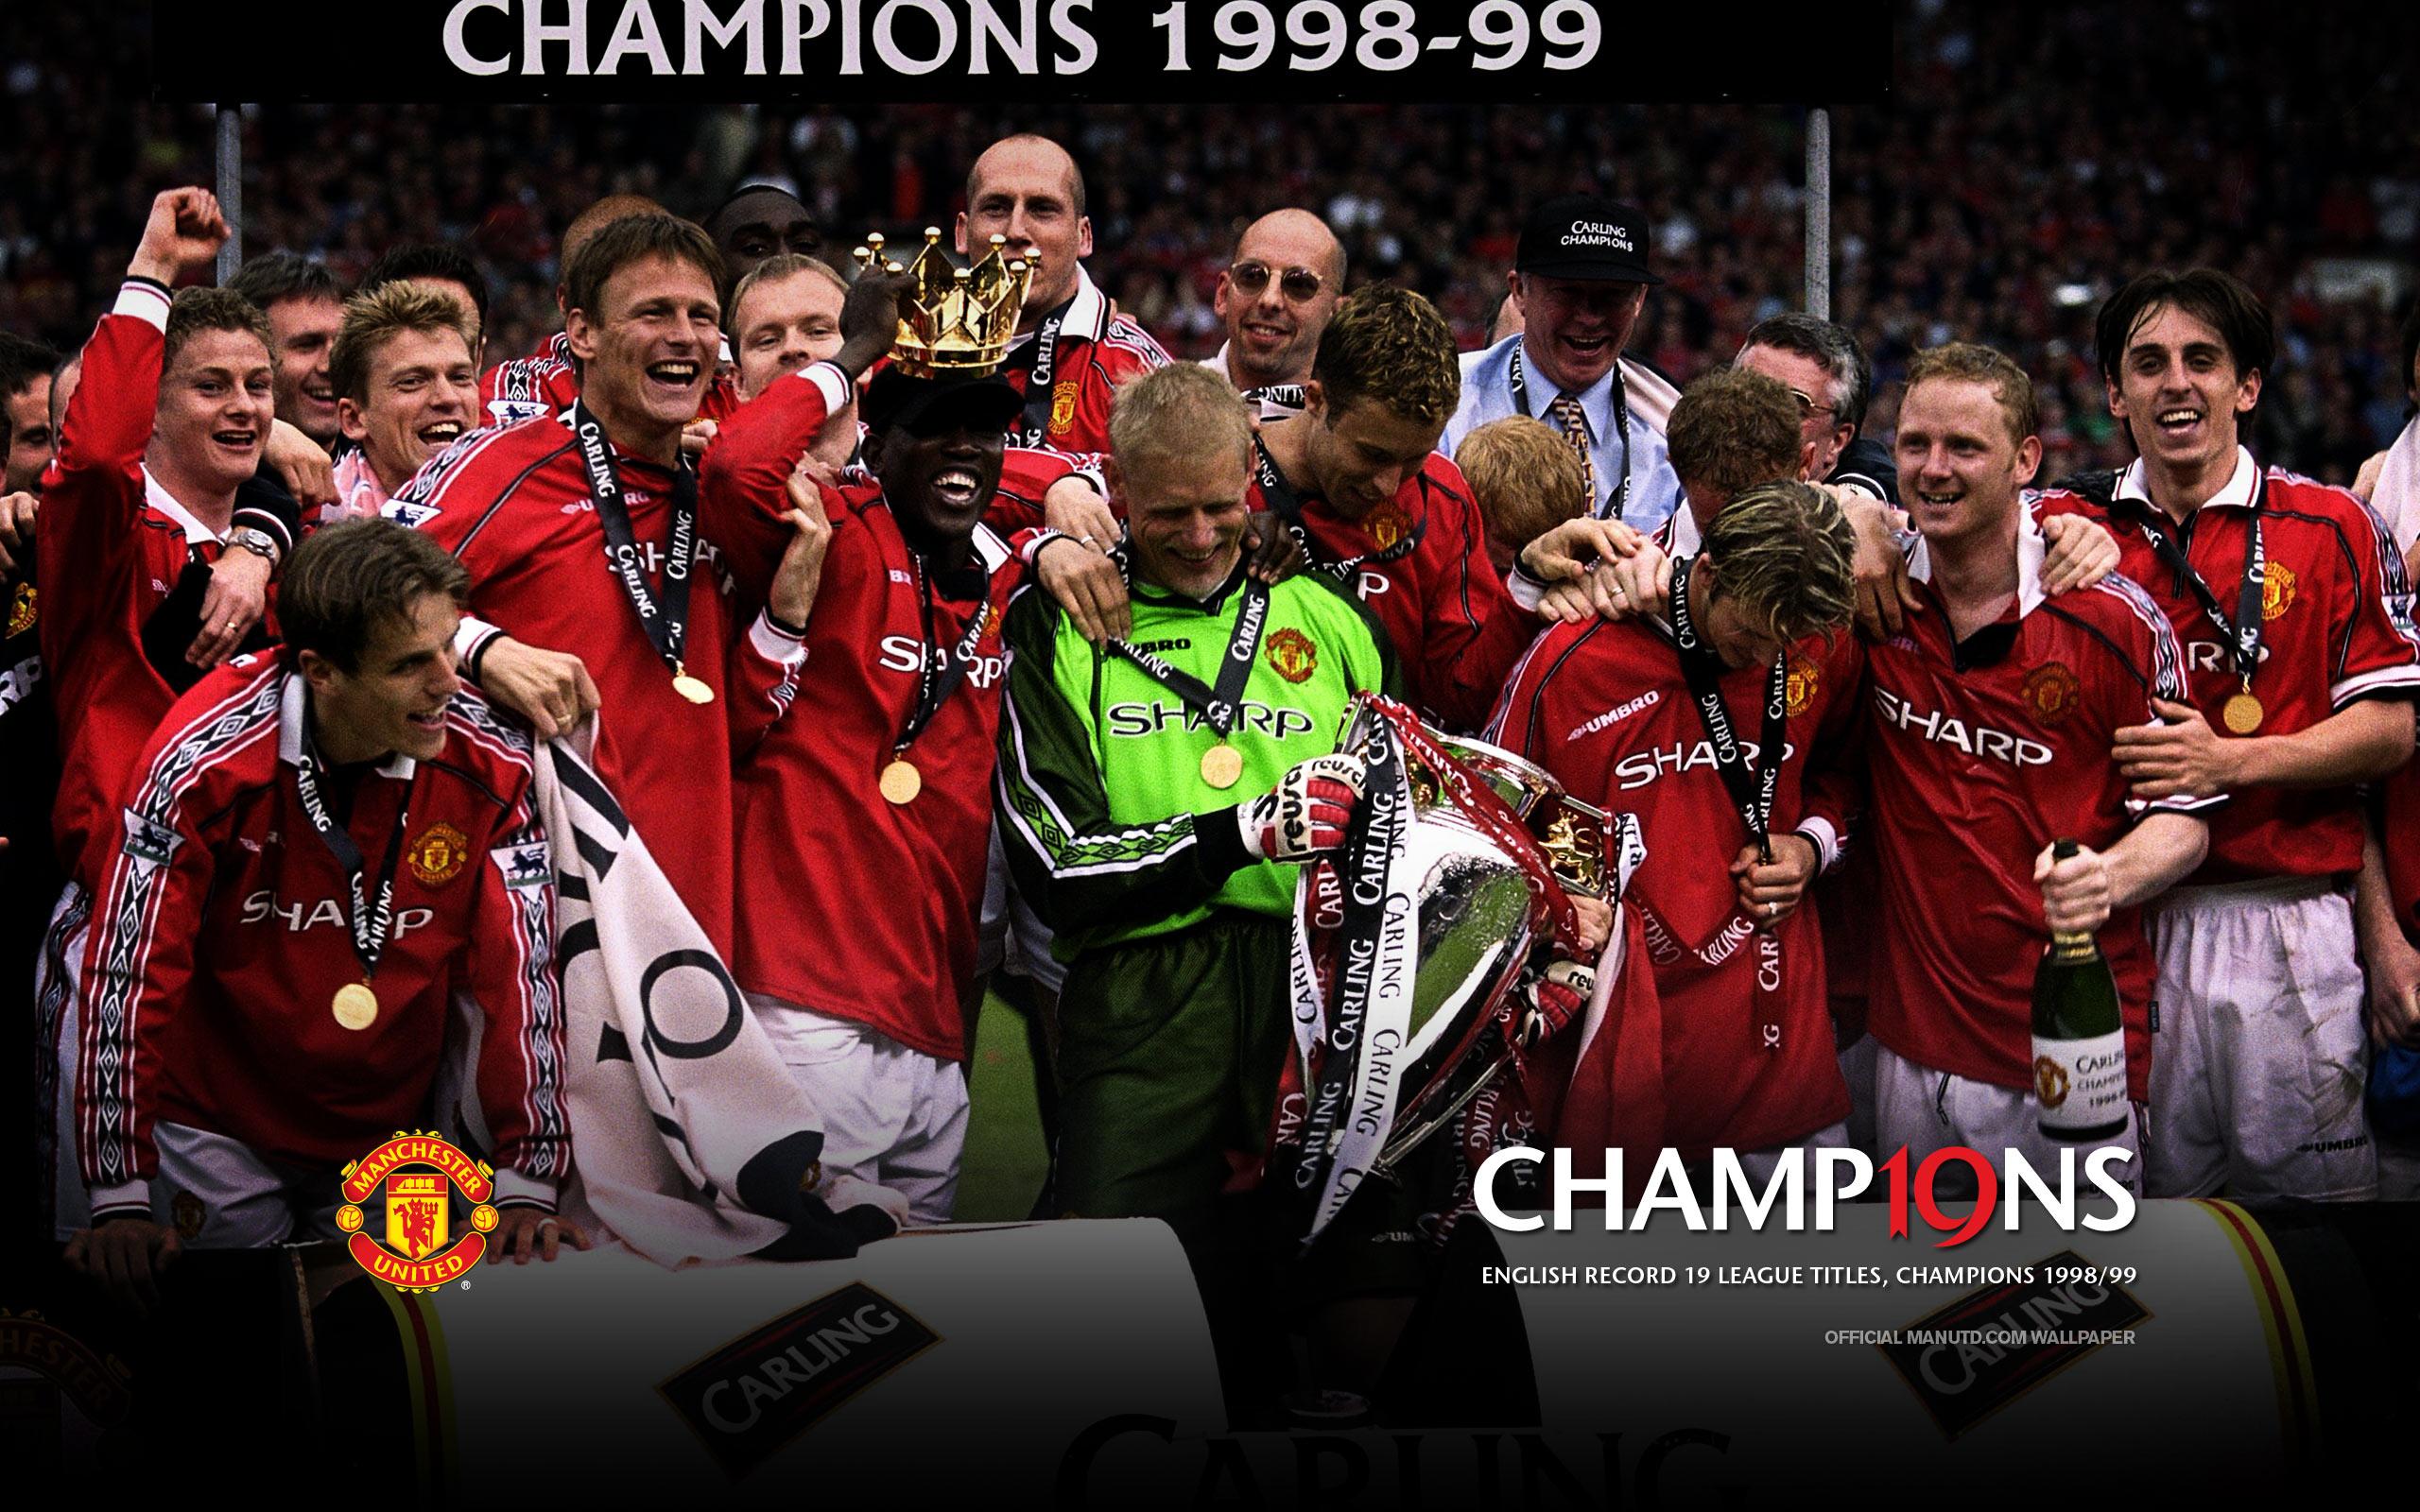 Sport Wallpaper Manchester United: Manchester United Wallpaper